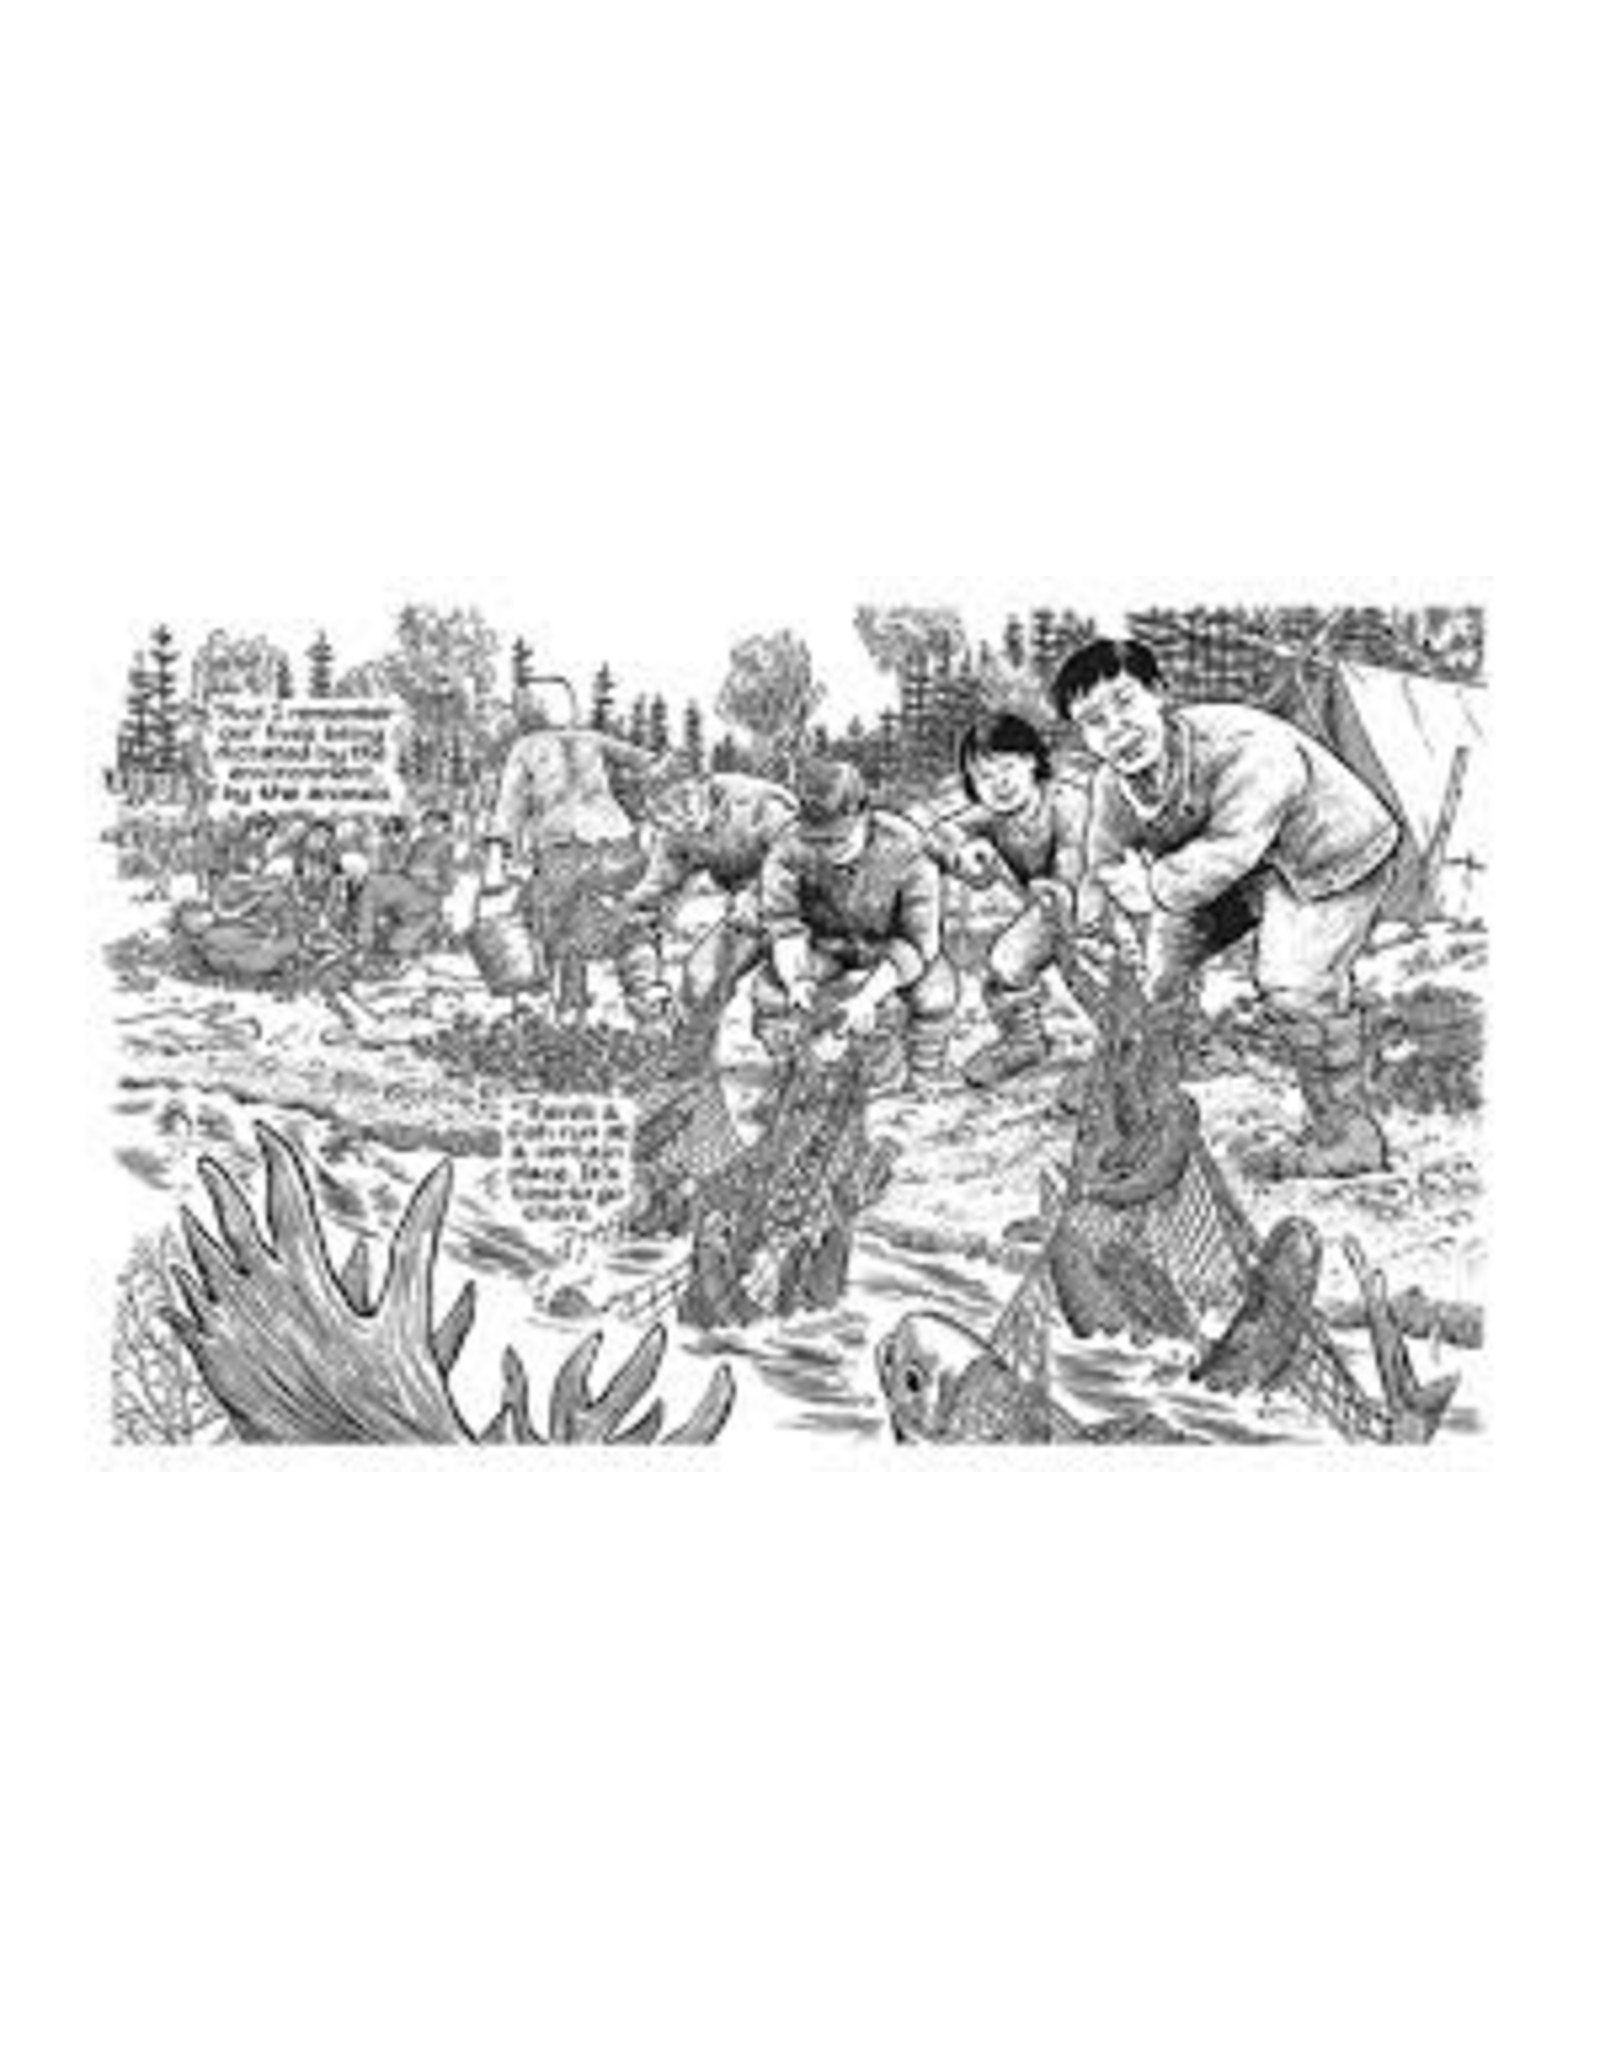 Books Paying the Land by Joe Sacco